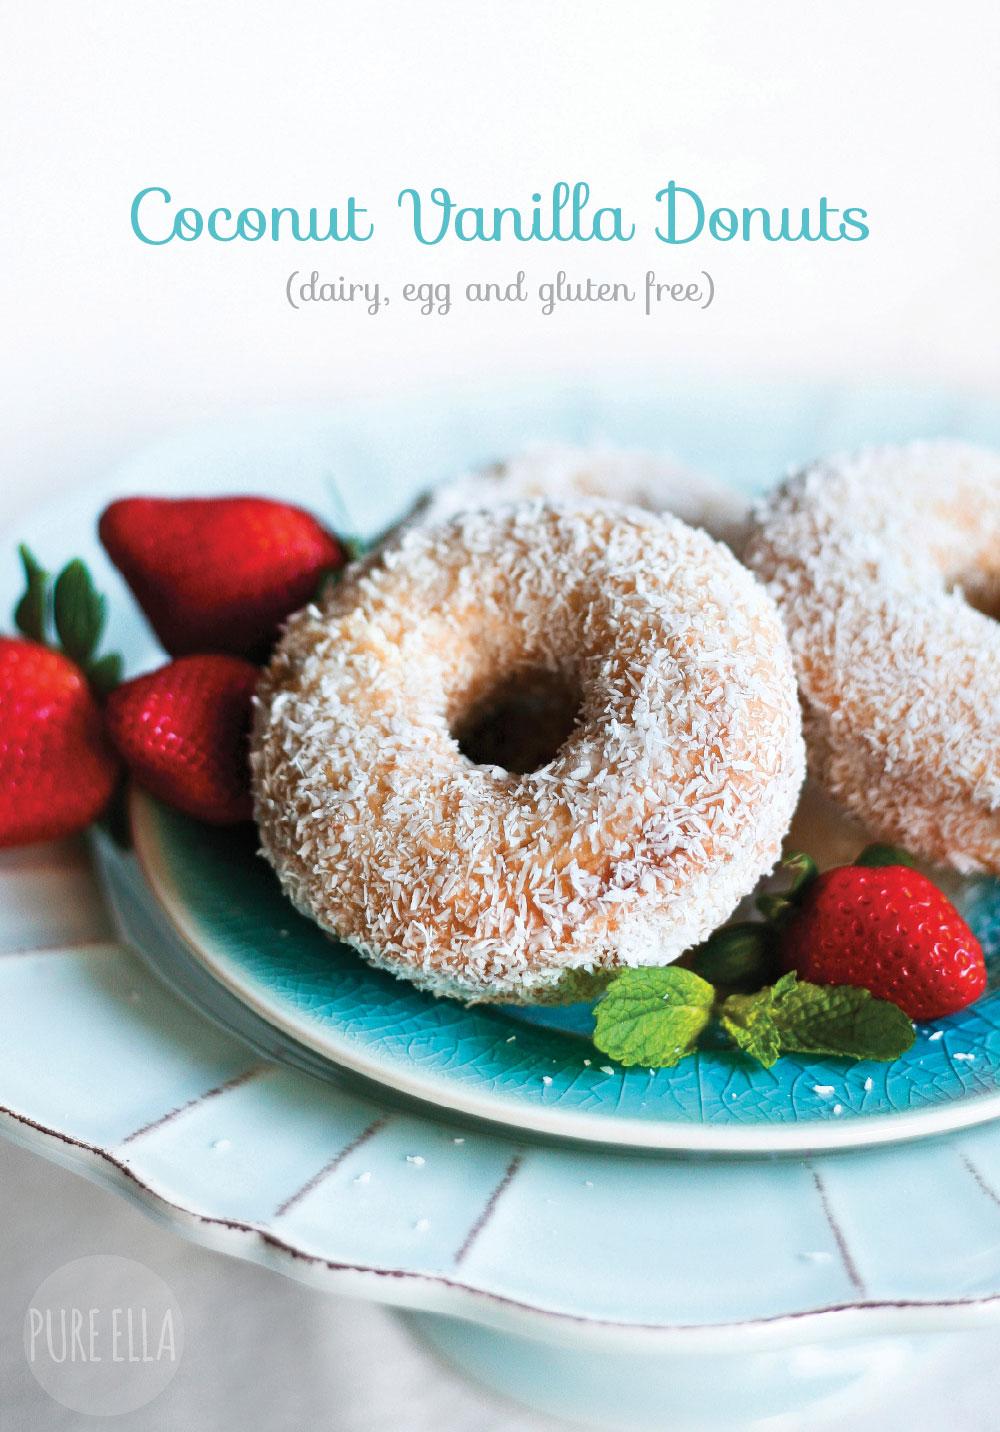 Pure-Ella-gluten-free-vegan-coconut-vanilla-donuts-so-delicious